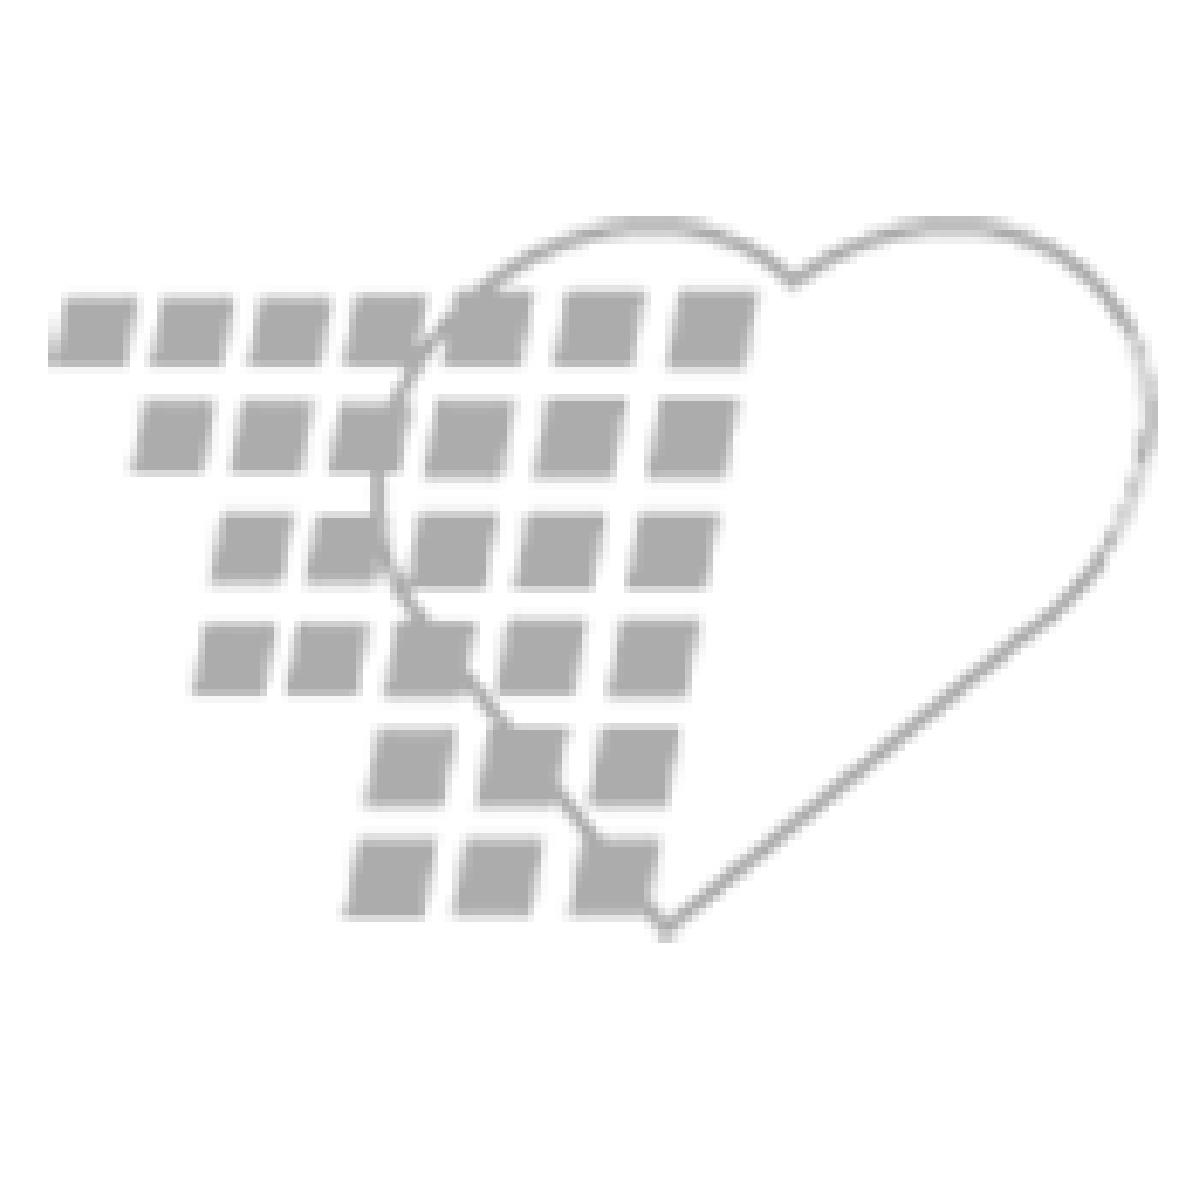 06-93-6005 - Demo Dose® Simulated Blood O Positive